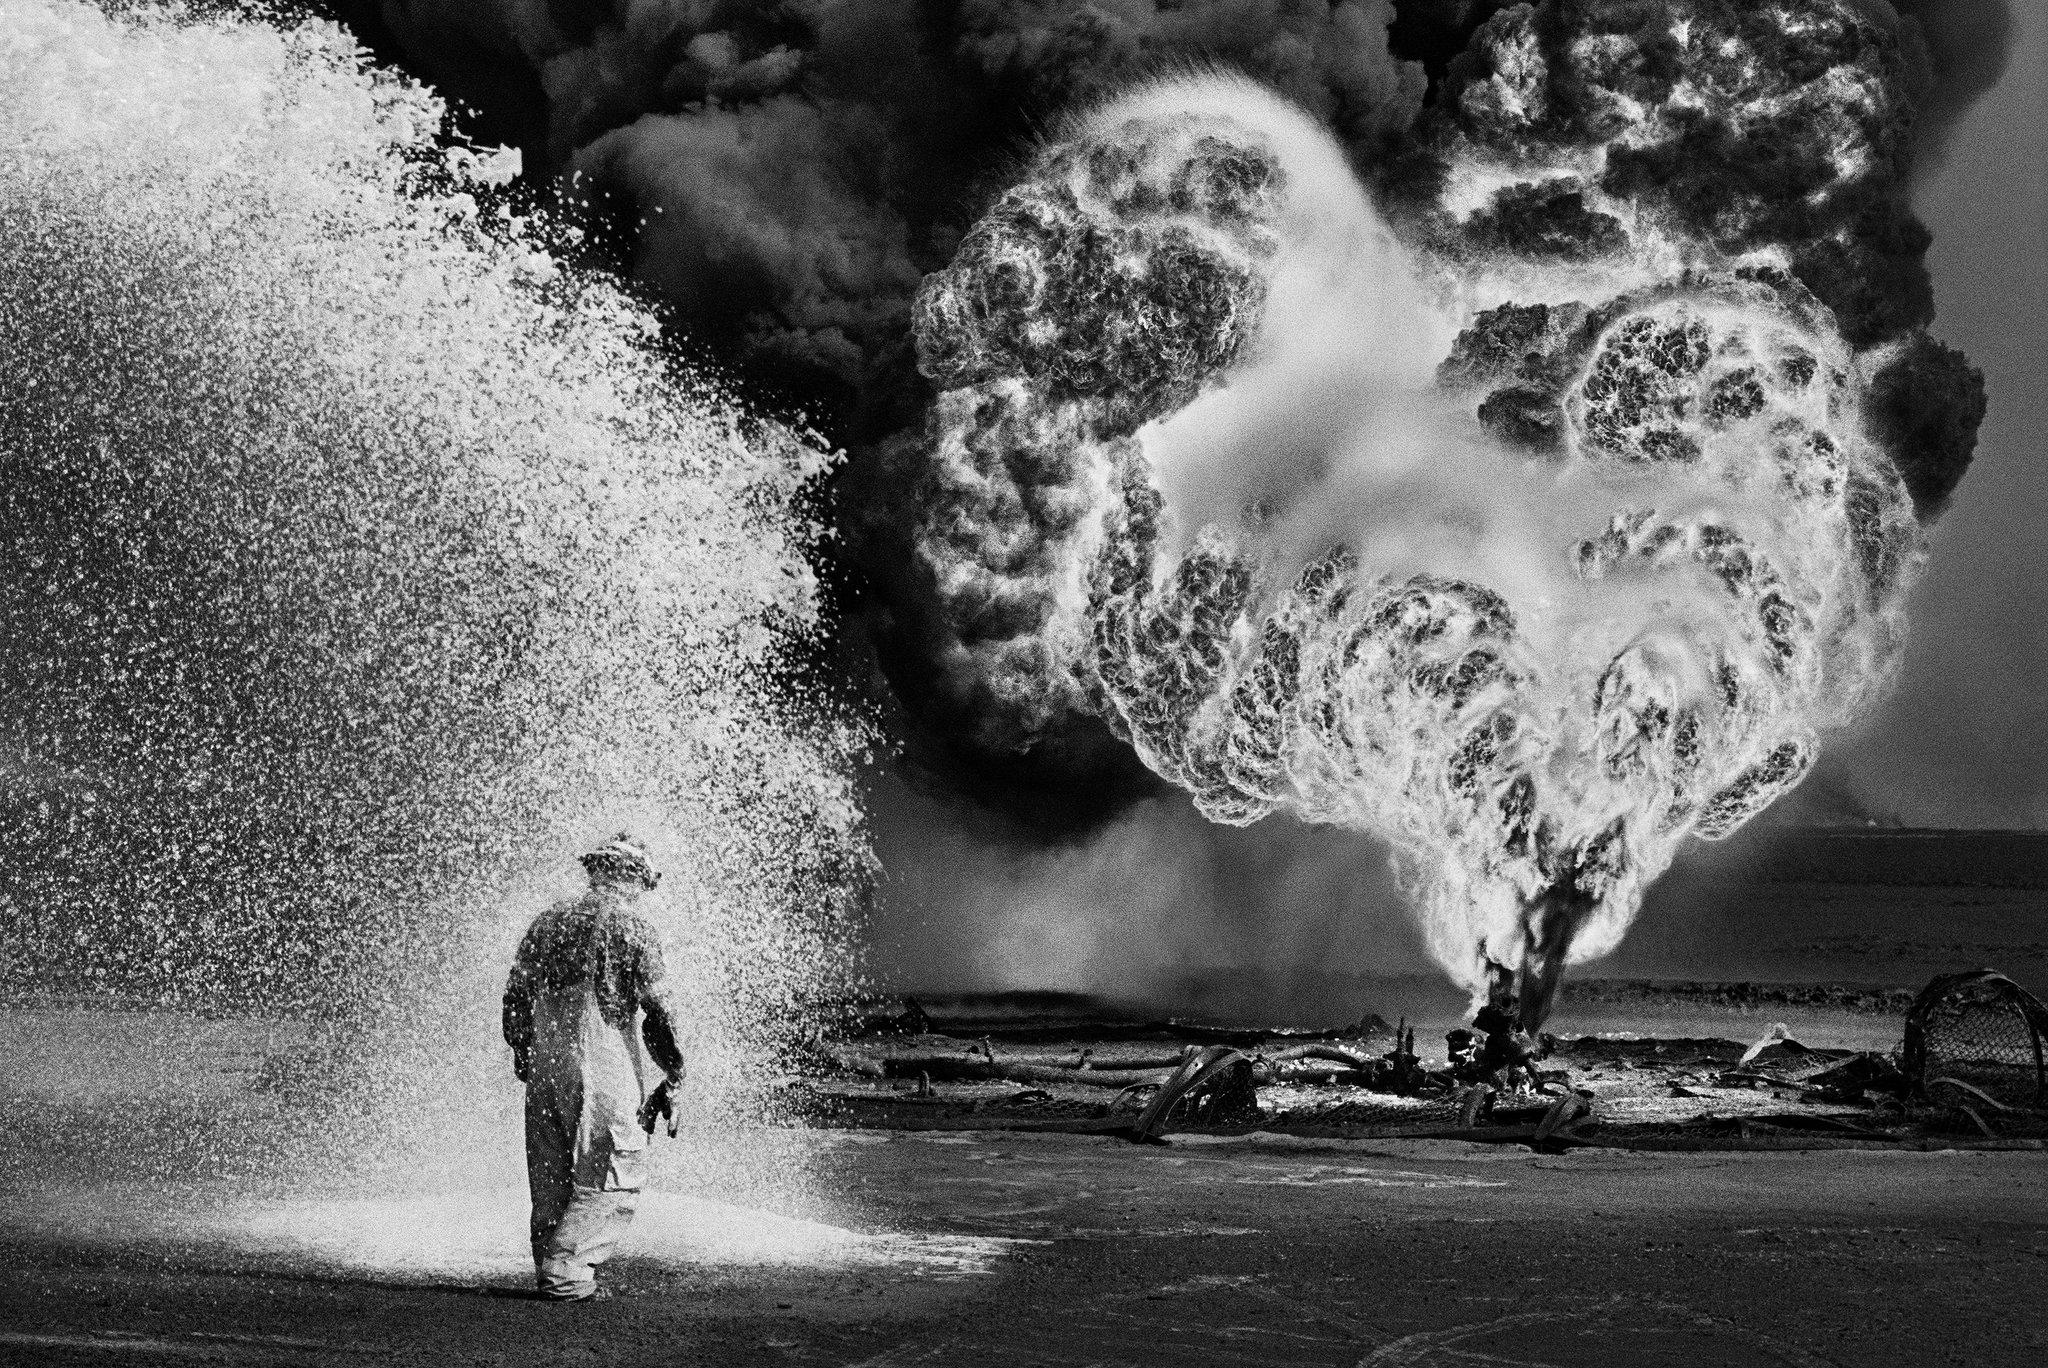 Kuwait © Sebastião Salgado